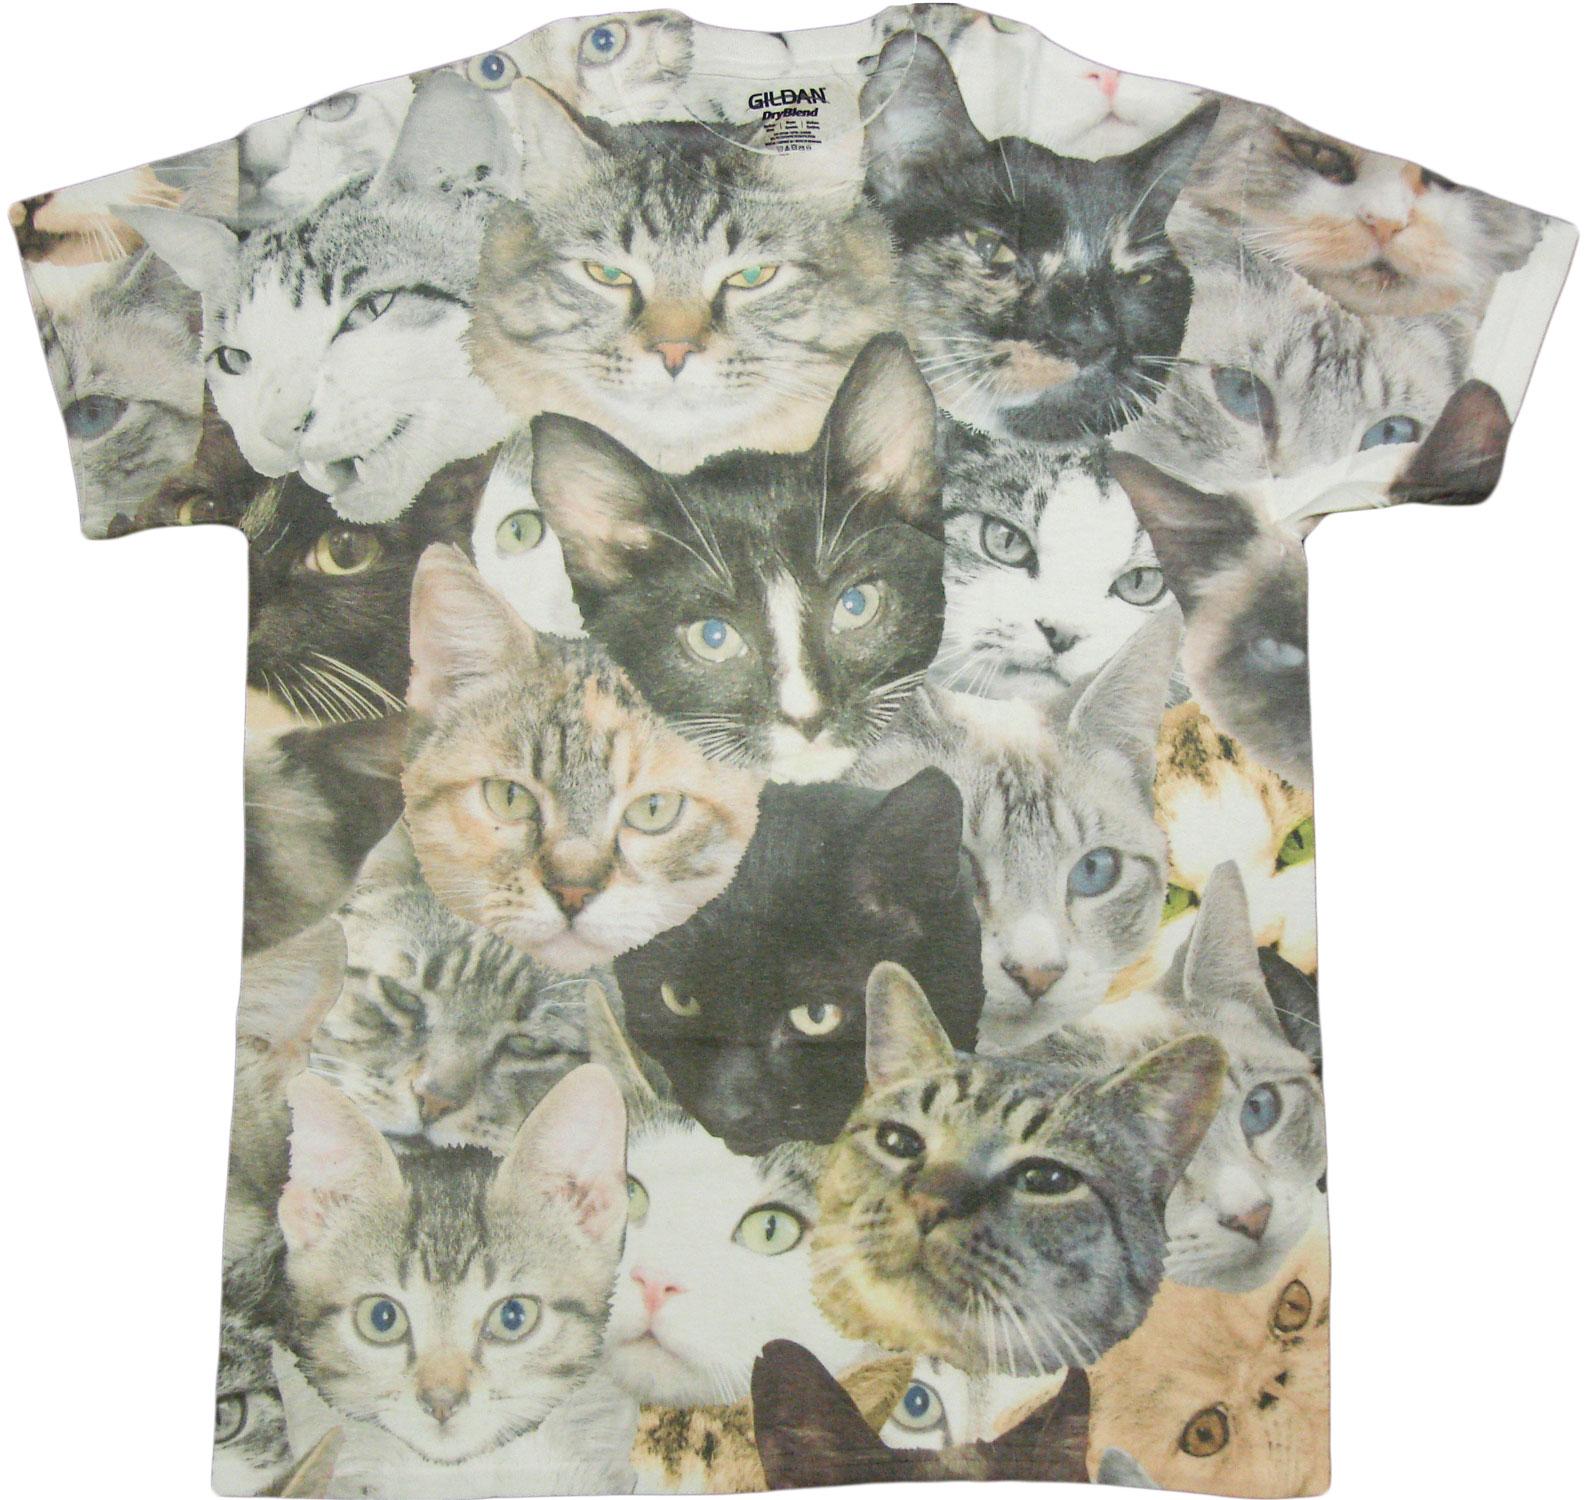 89c1c11f6248 Details about Cat Faces Print Sublimated Adult T-Shirt - Grumpy Cat Lovers  Pet Pusheen Gift